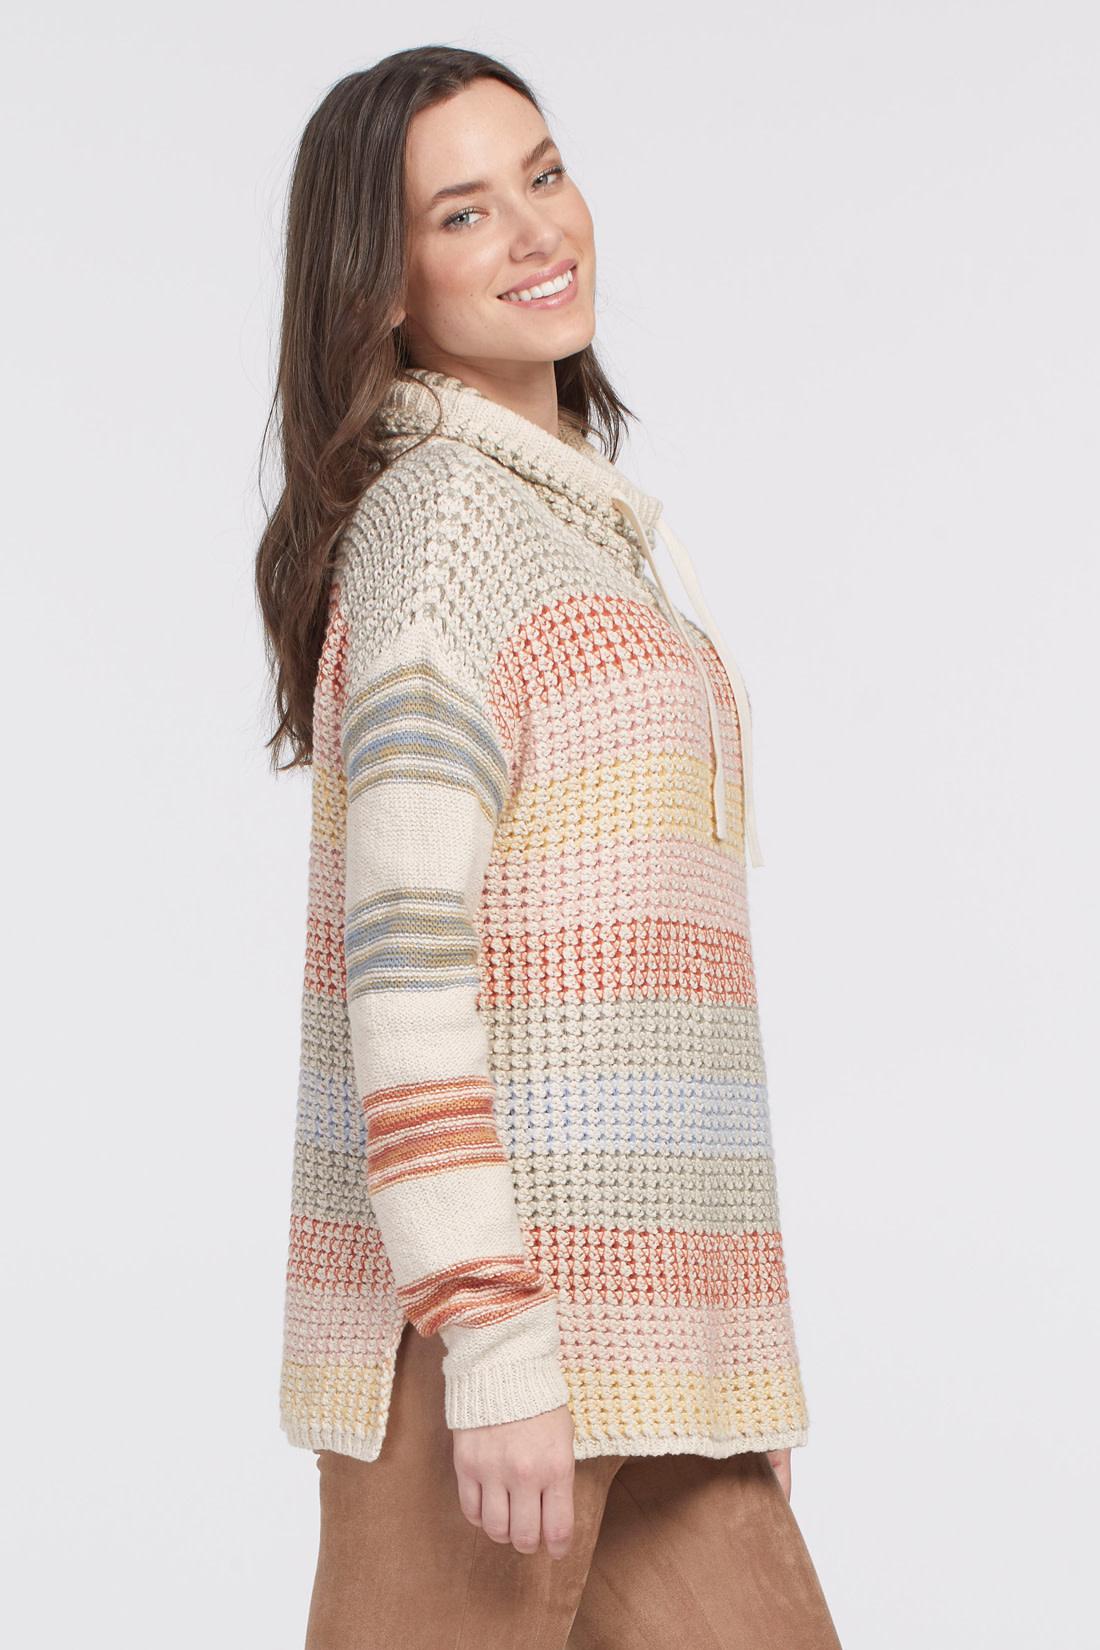 Blush Stripe Dropped Shoulder Sweater